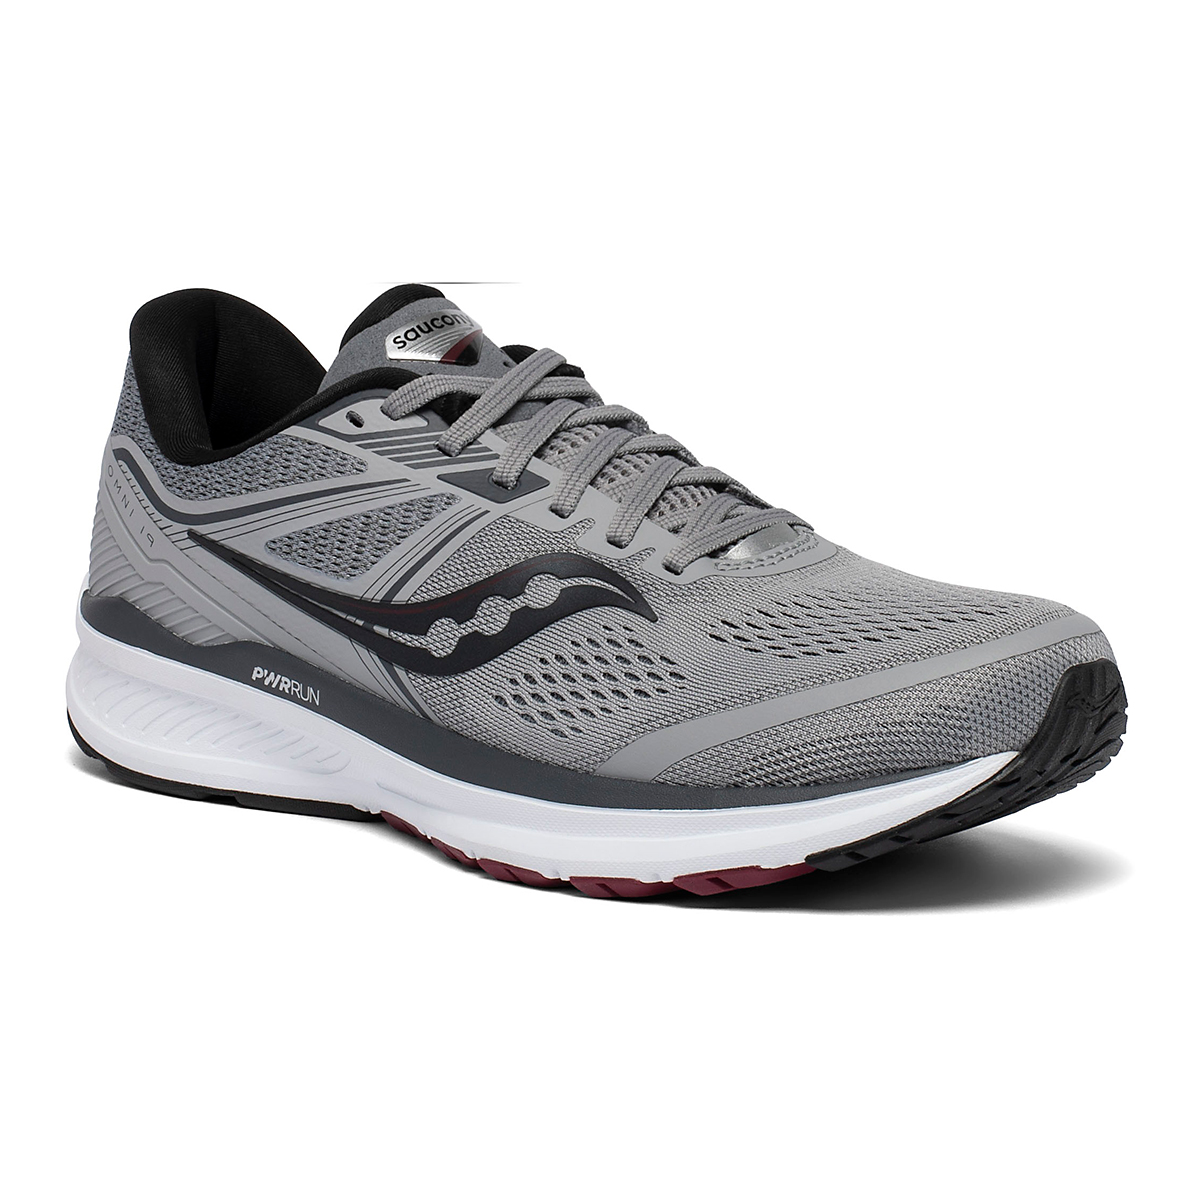 Men's Saucony Omni 19 Running Shoe - Color: Alloy/Brick - Size: 7 - Width: Wide, Alloy/Brick, large, image 5